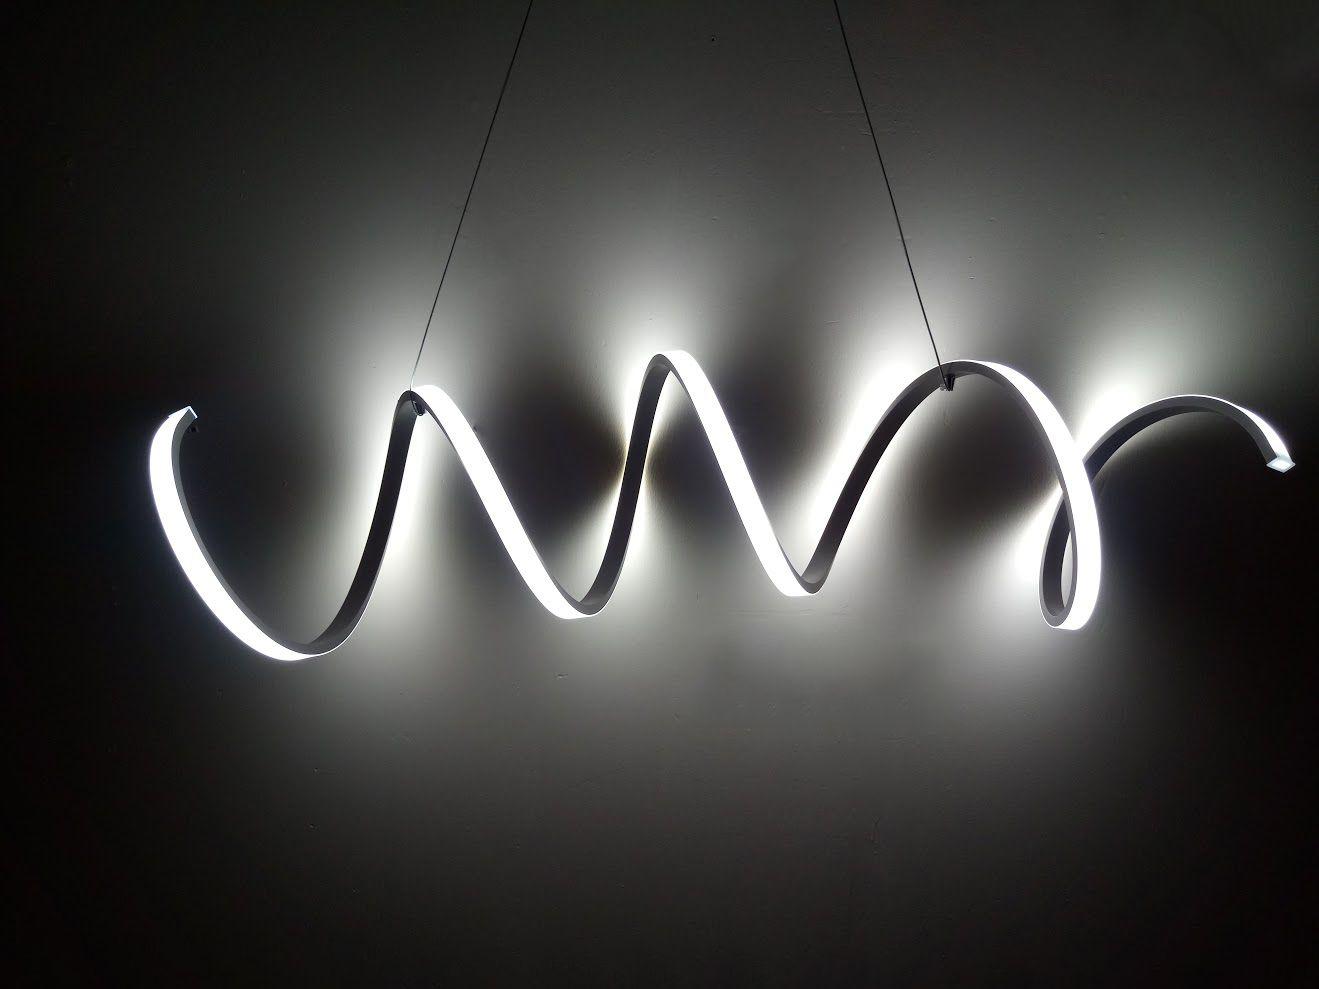 Spring Modern LED Pendant Light Fixture  Modern Place